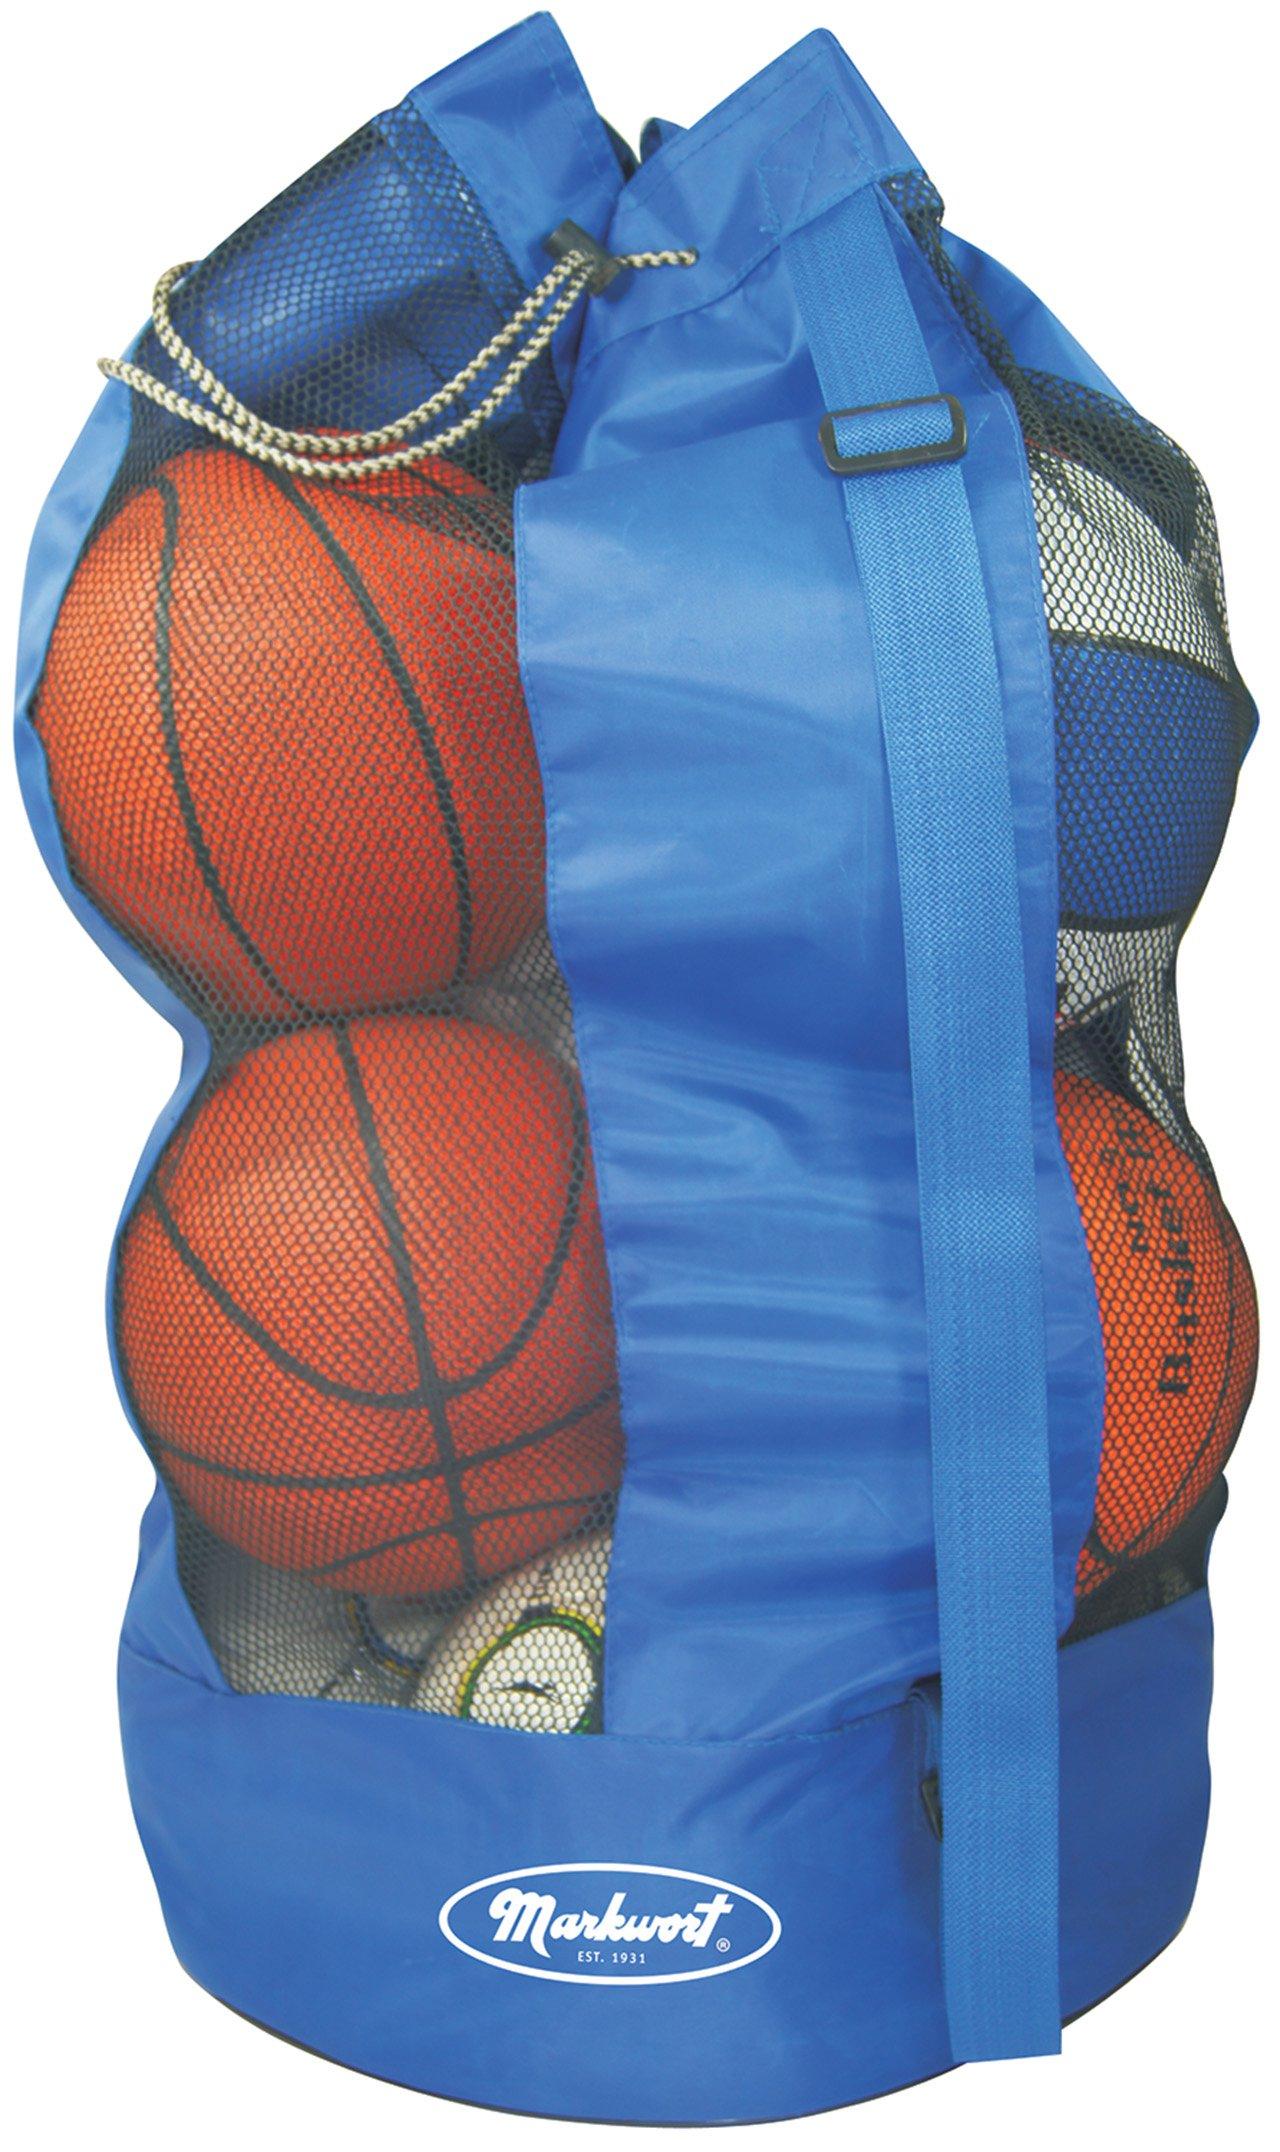 Markwort 8 Basketball Capacity Ball Bag, Blue